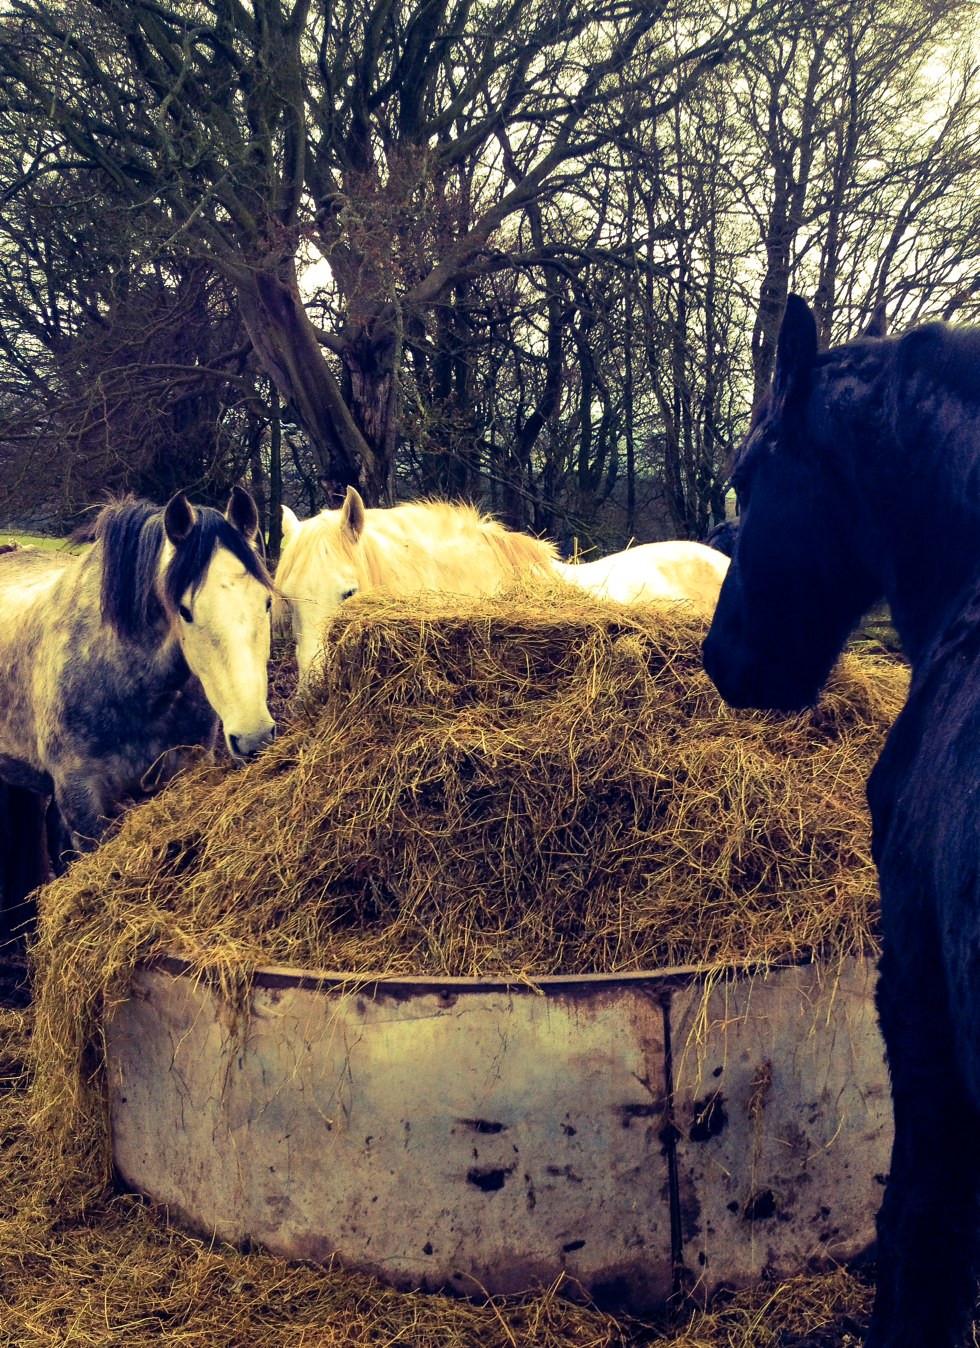 Louie, Alfie and Oedske enjoy breakfast at the haylage bar! #happyhorses @lesamisdonno